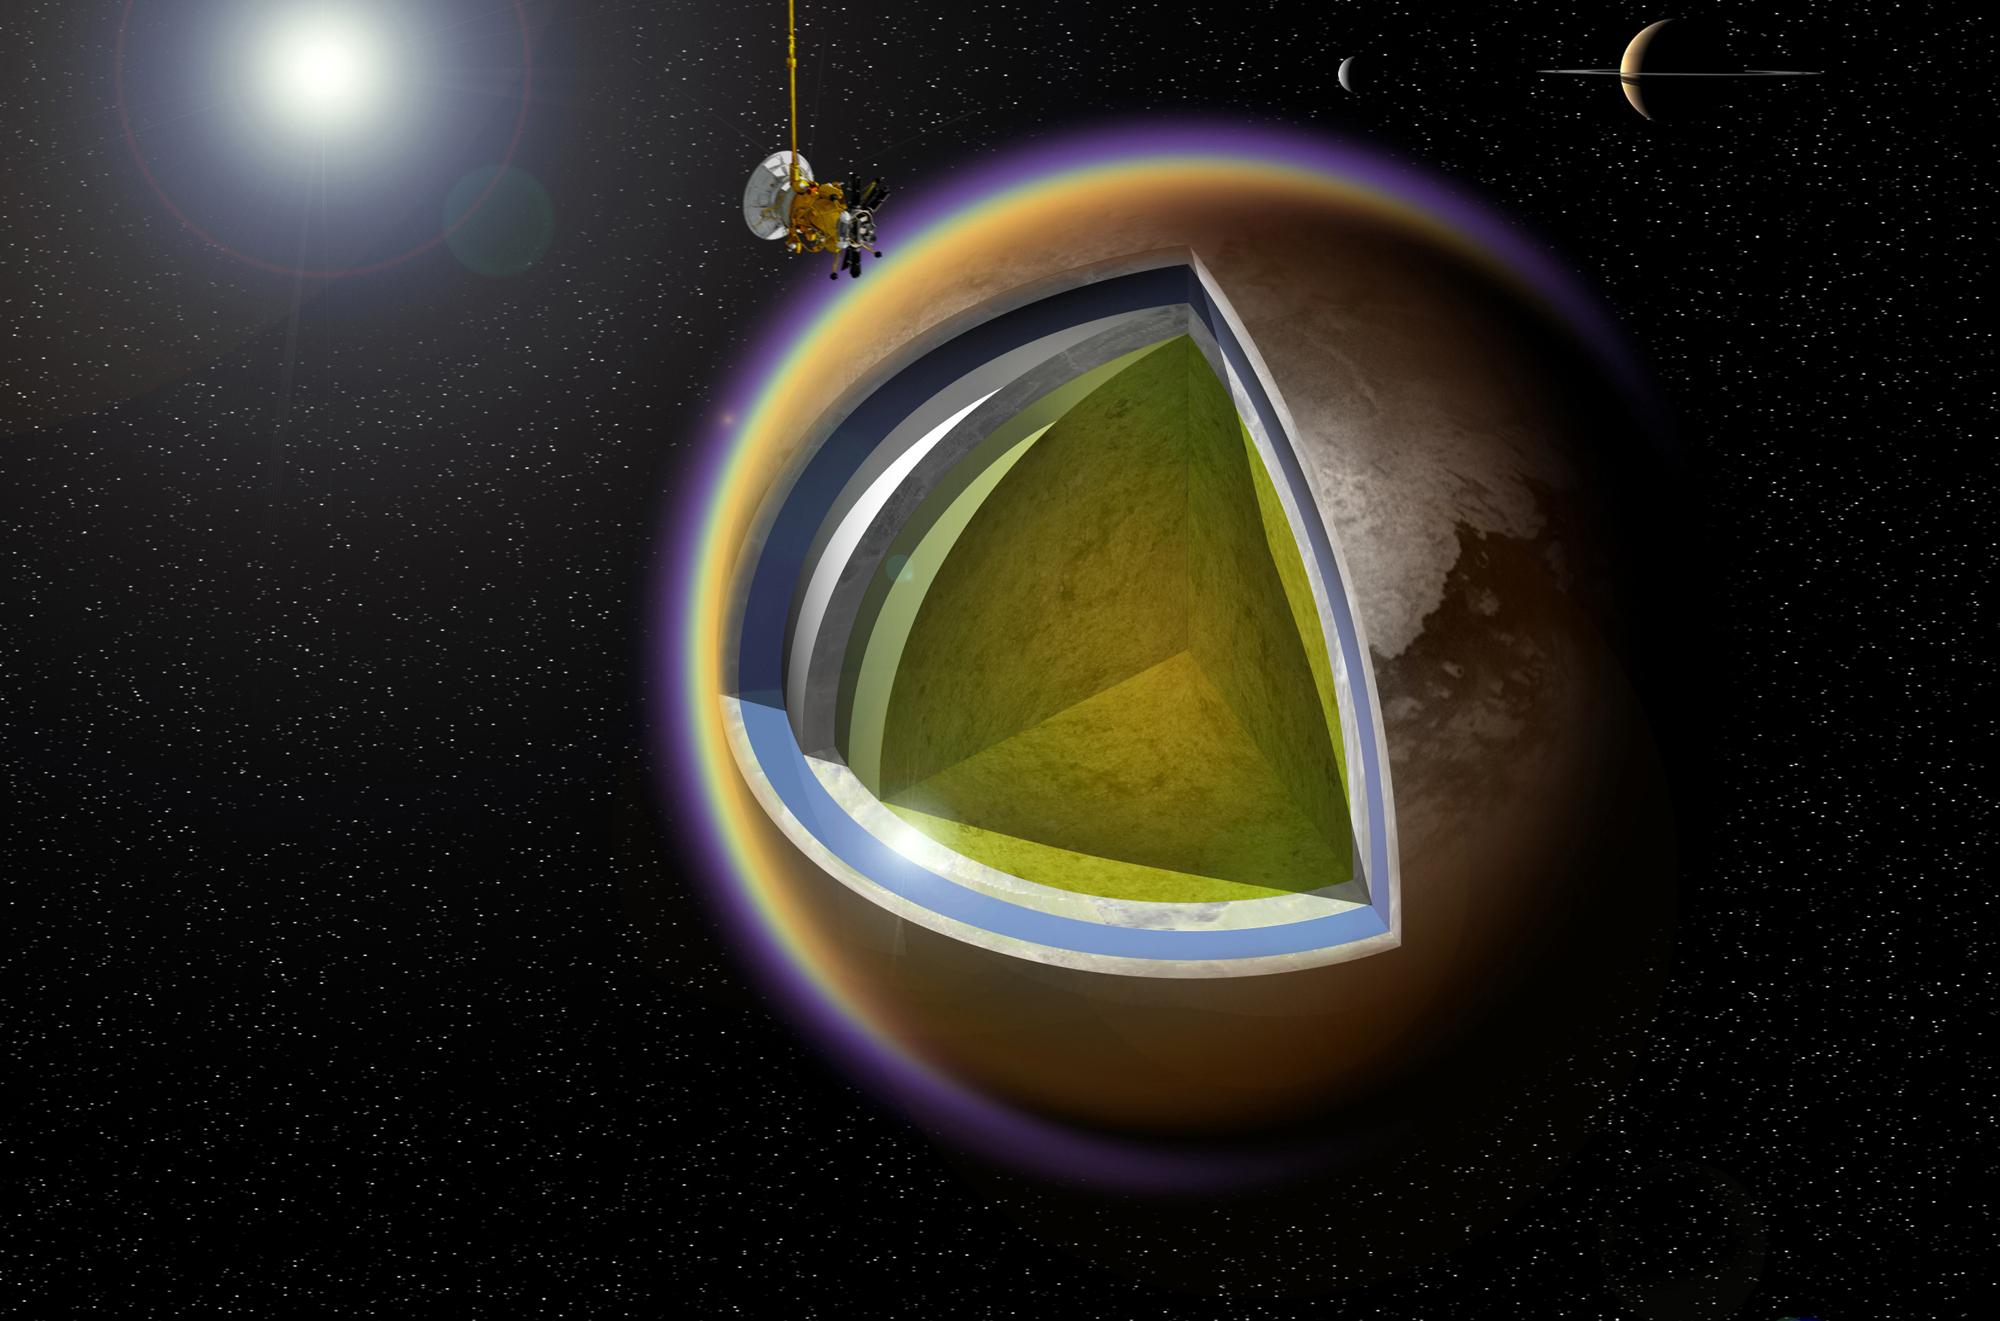 NASA Spacecraft Buzzes Saturn's Largest Moon Titan for ...